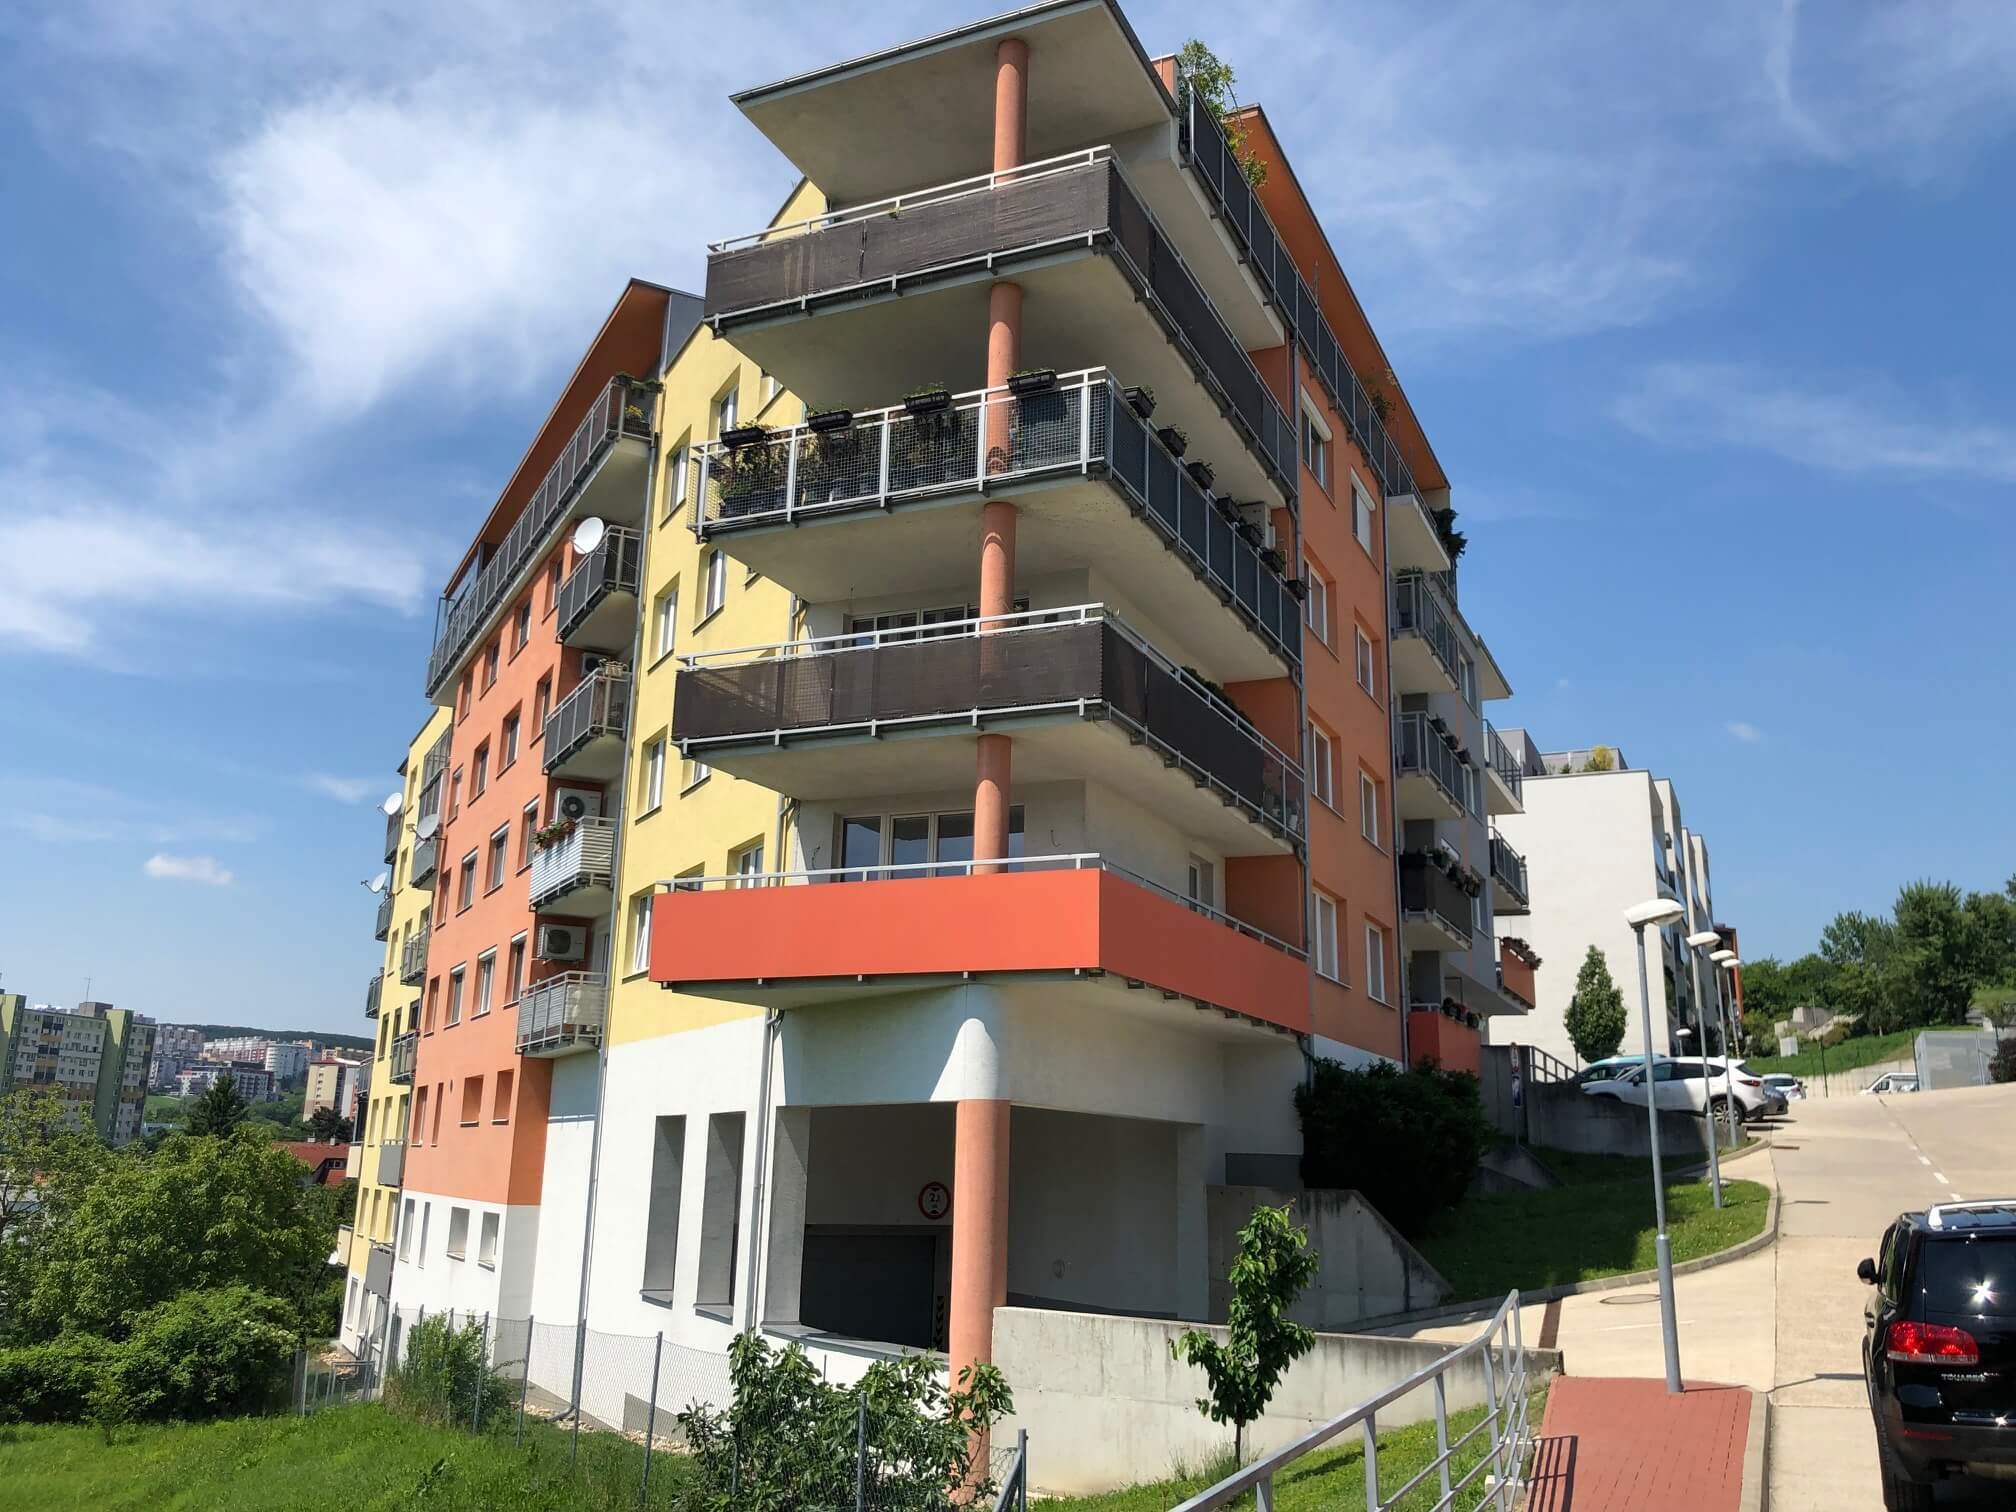 Rezervované: 3 izbový byt, novostavba, 72,25m2, loggia 4,82m2, Staré Grunty, Karlovka, garážové státie-0